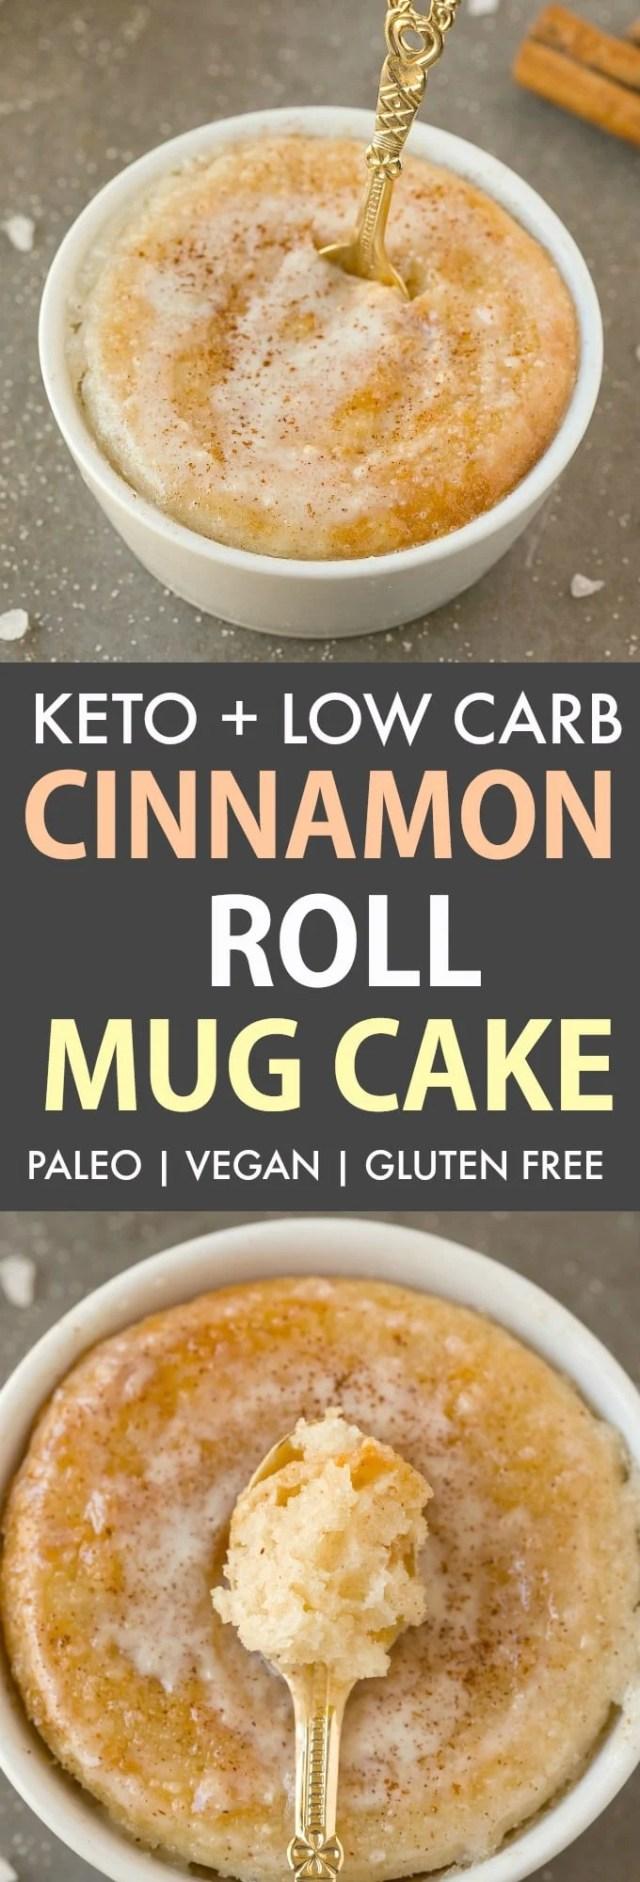 A keto cinnamon roll mug cake topped with a cinnamon glaze